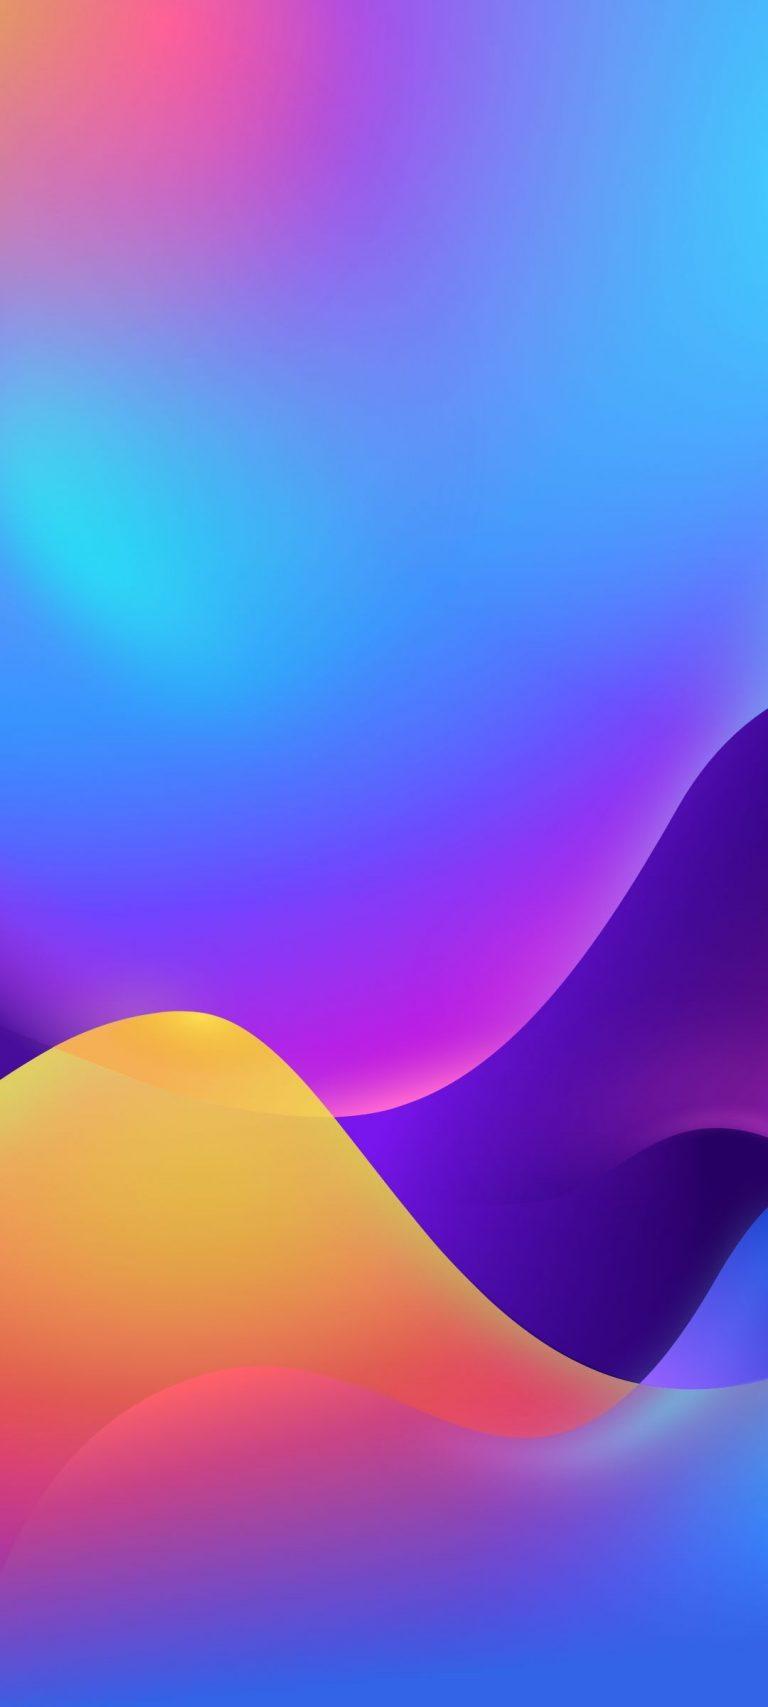 Realme UI 2.0 Stock Wallpaper [1080x2400] - 02